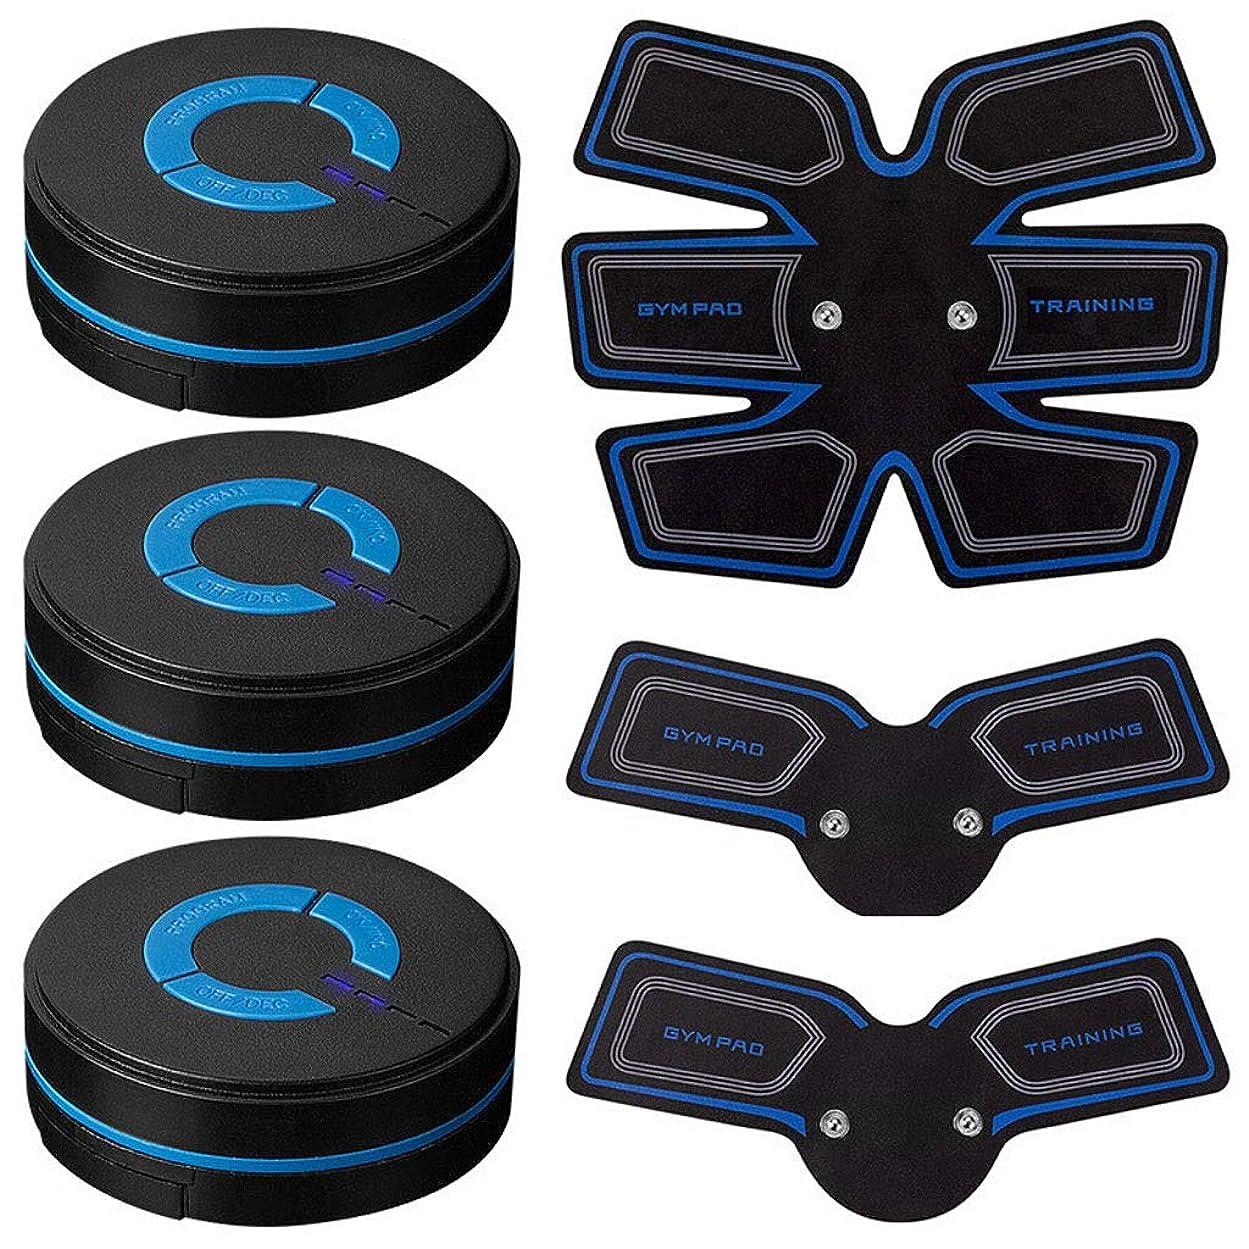 USB充電筋肉トナー腹筋absシミュレータ腹部調色ベルトワークアウトワイヤレスEMSトレーニングホームオフィス用腹部/腕/脚トレーニングホームオフィス (Size : 3 host 1 set of stickers)